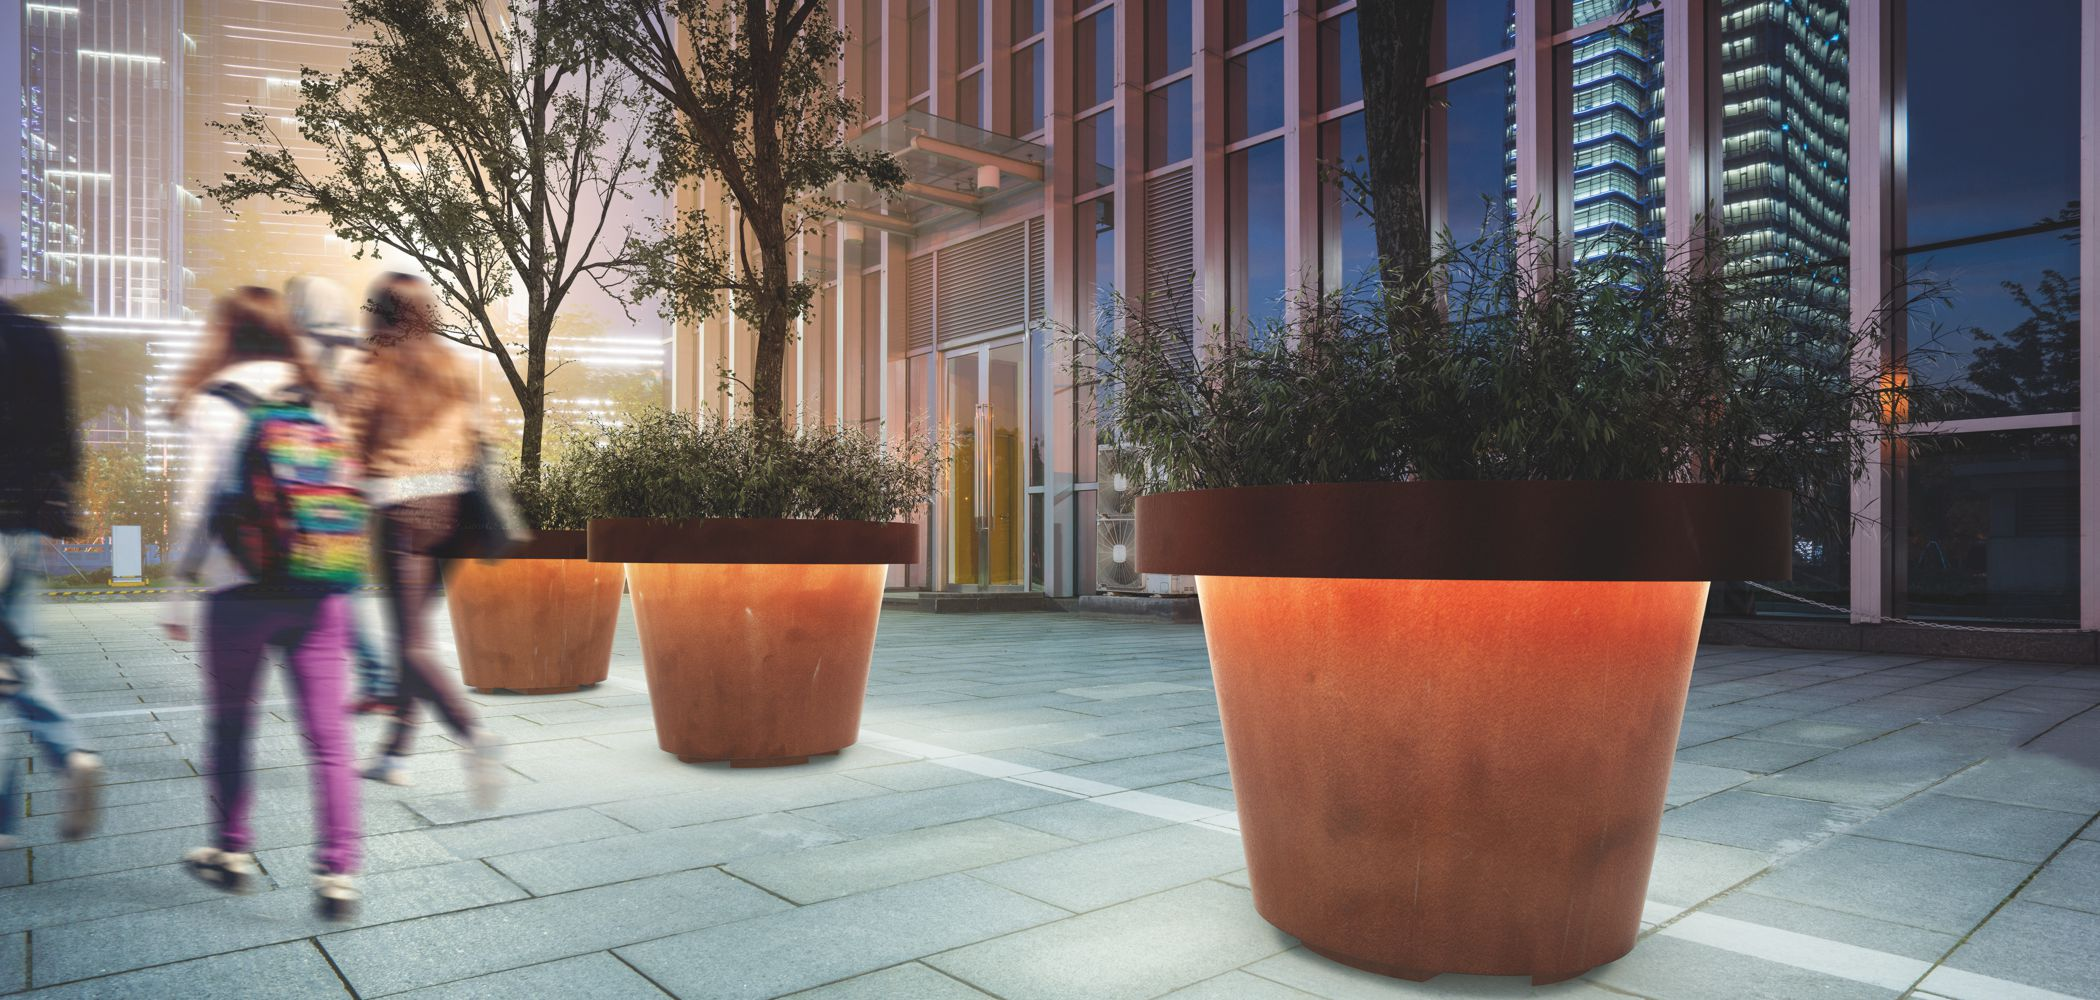 id created/metalco size planter